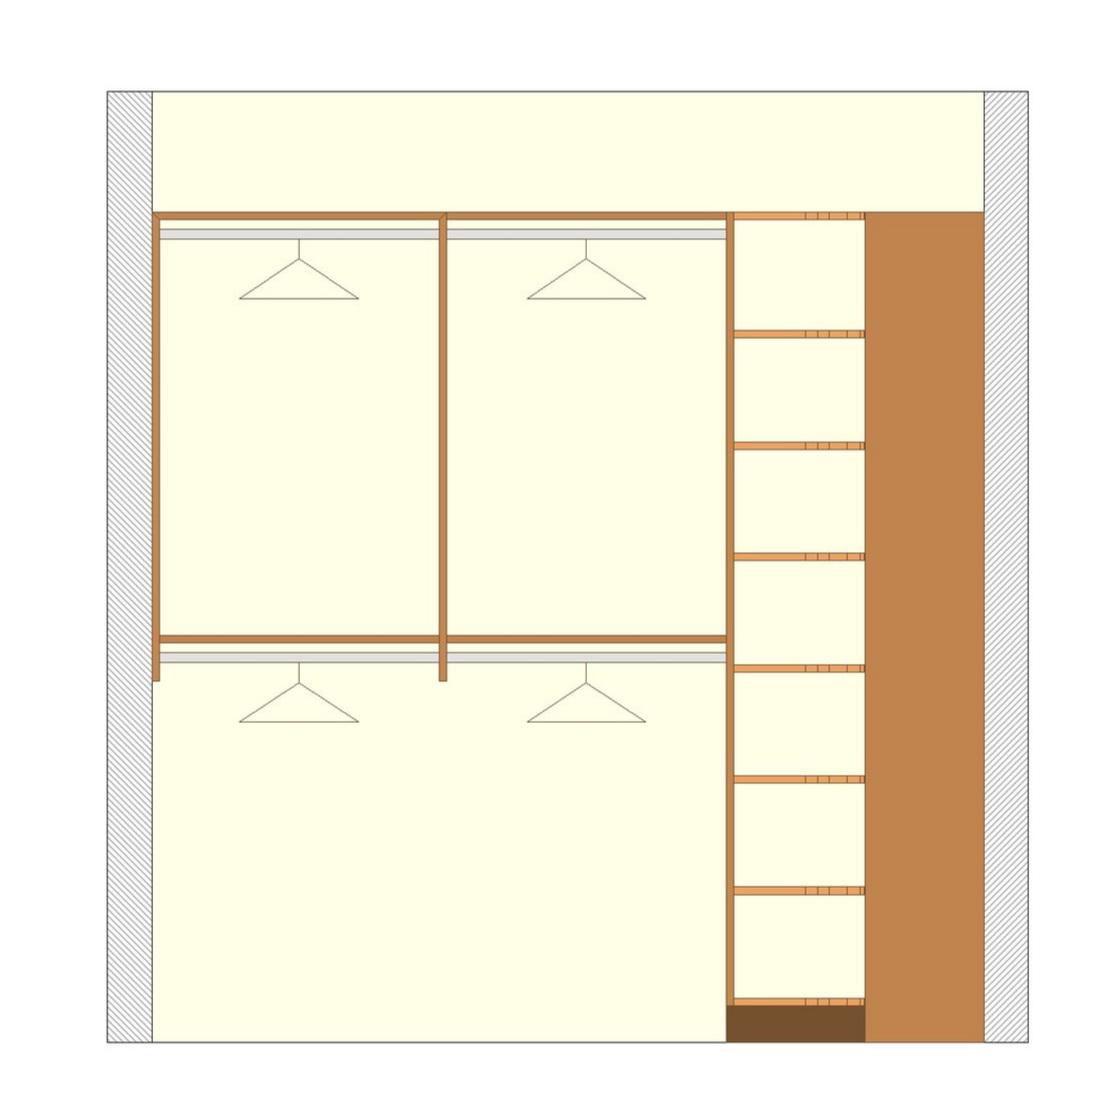 Hanging Racks & Radial Shelves - Deluxe Walk-In Closet (view 1)